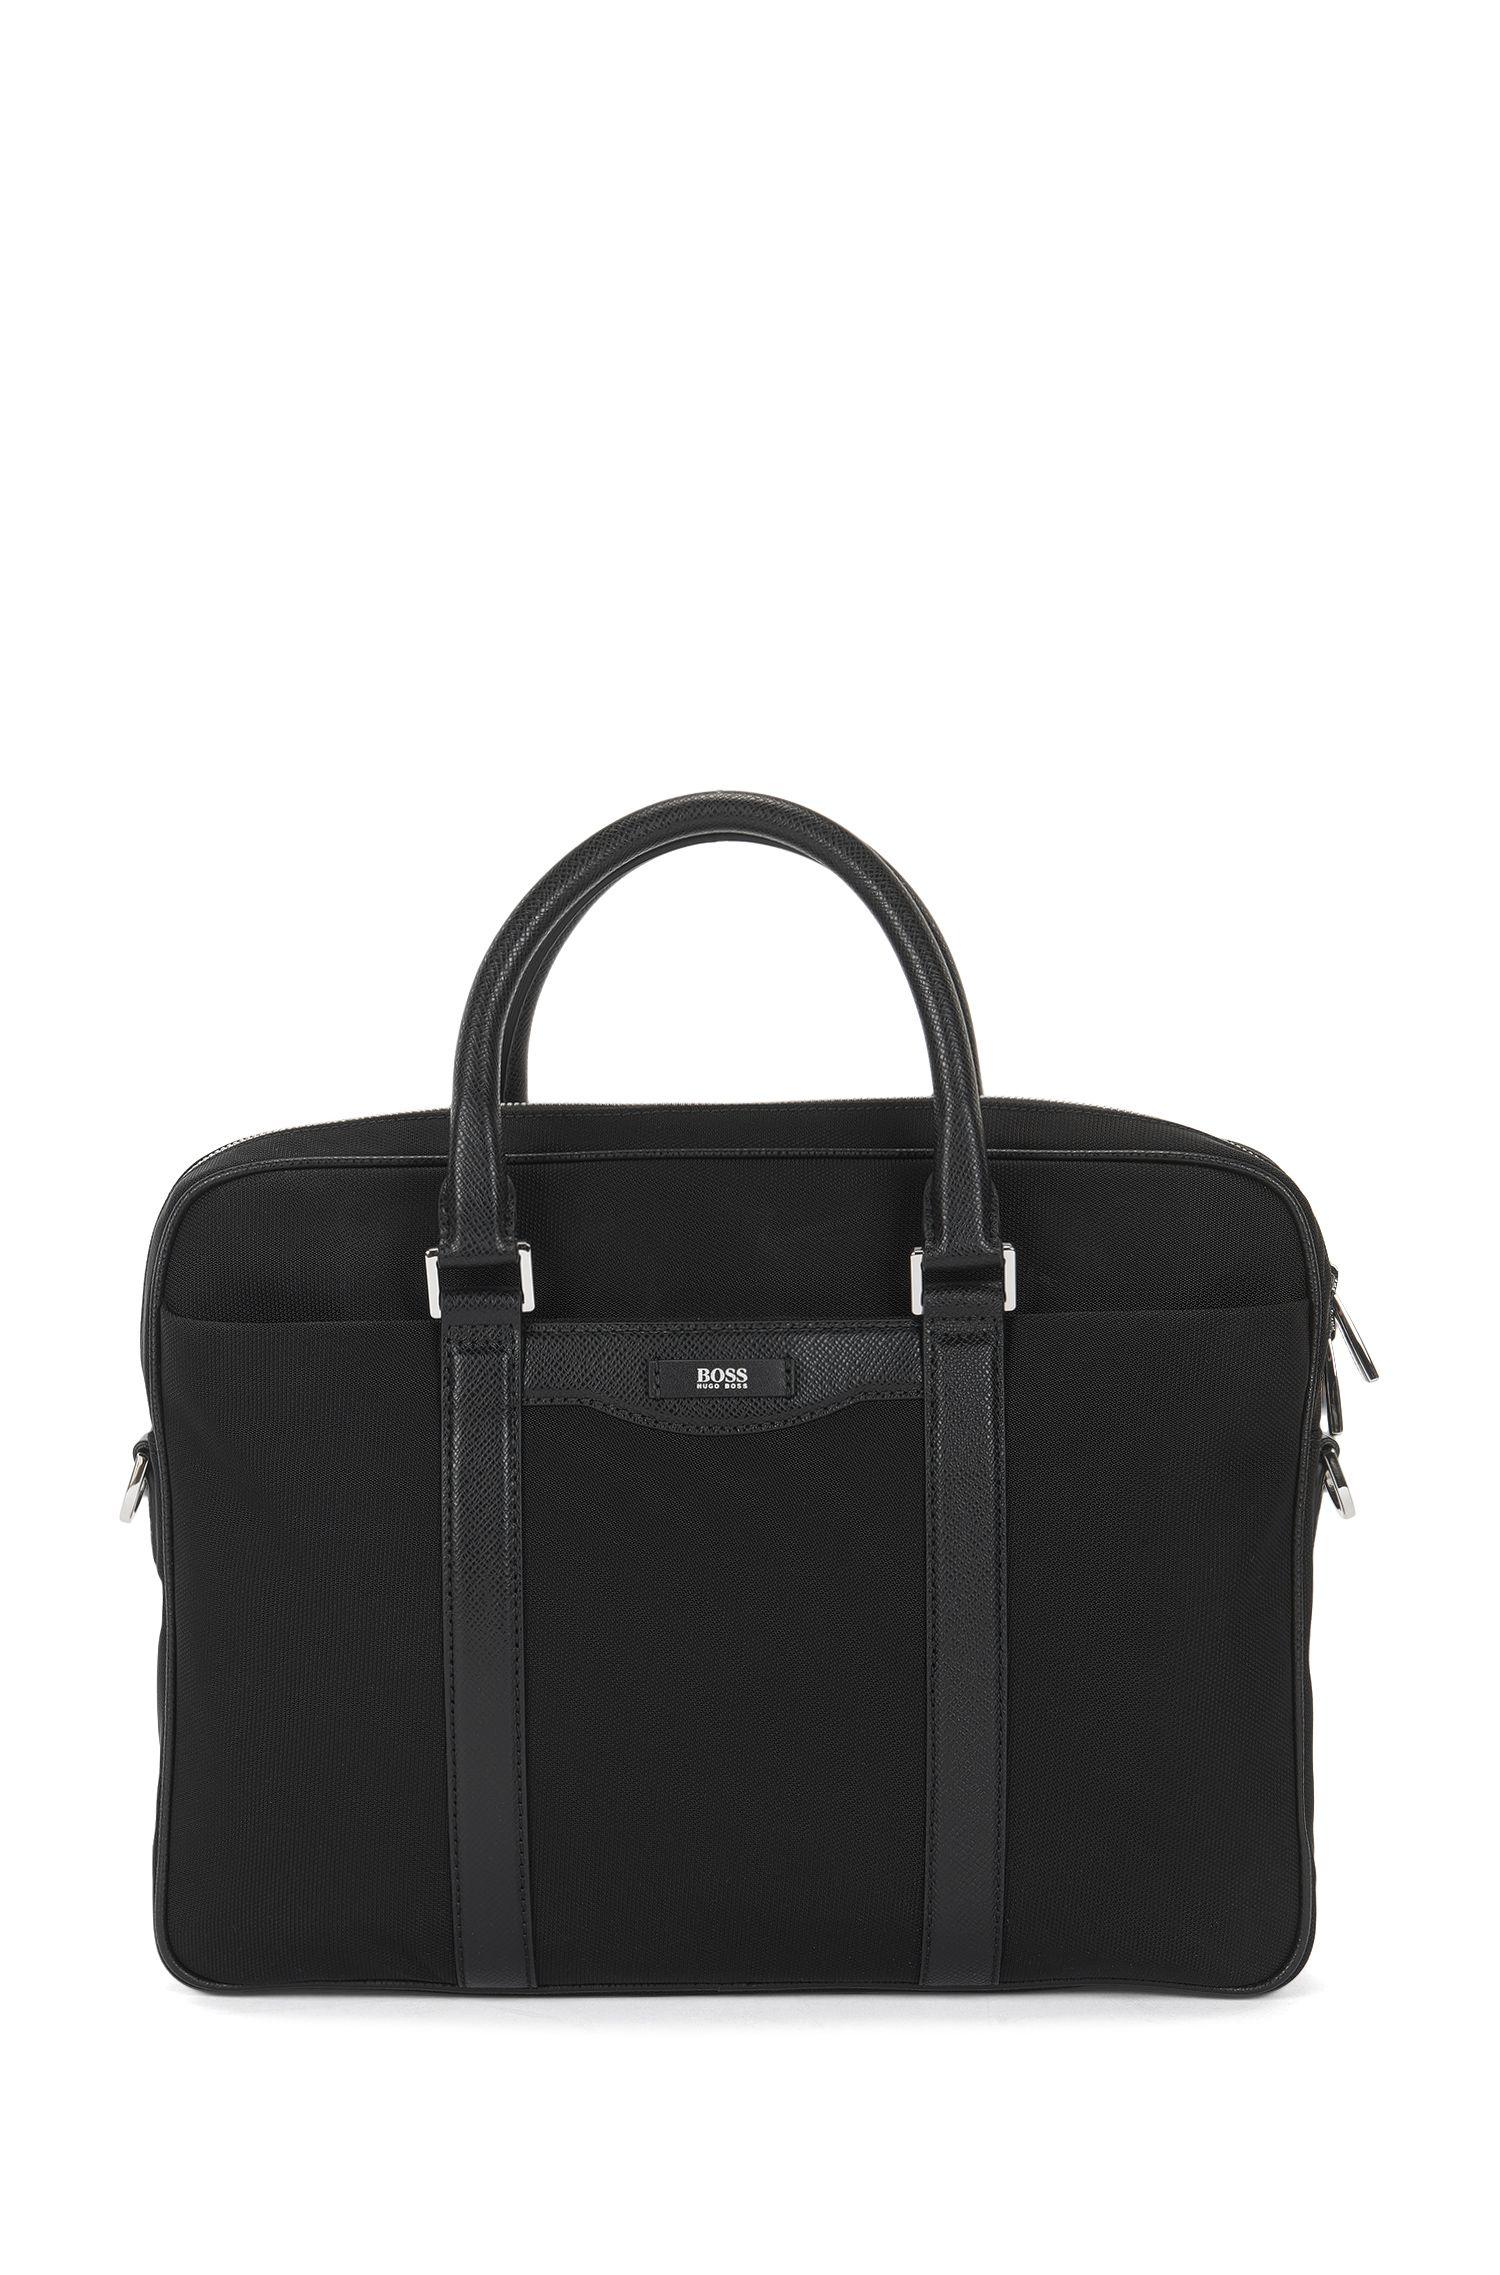 'Signature L_S doc' | Nylon Blend Workbag, Detachable Shoulder Strap